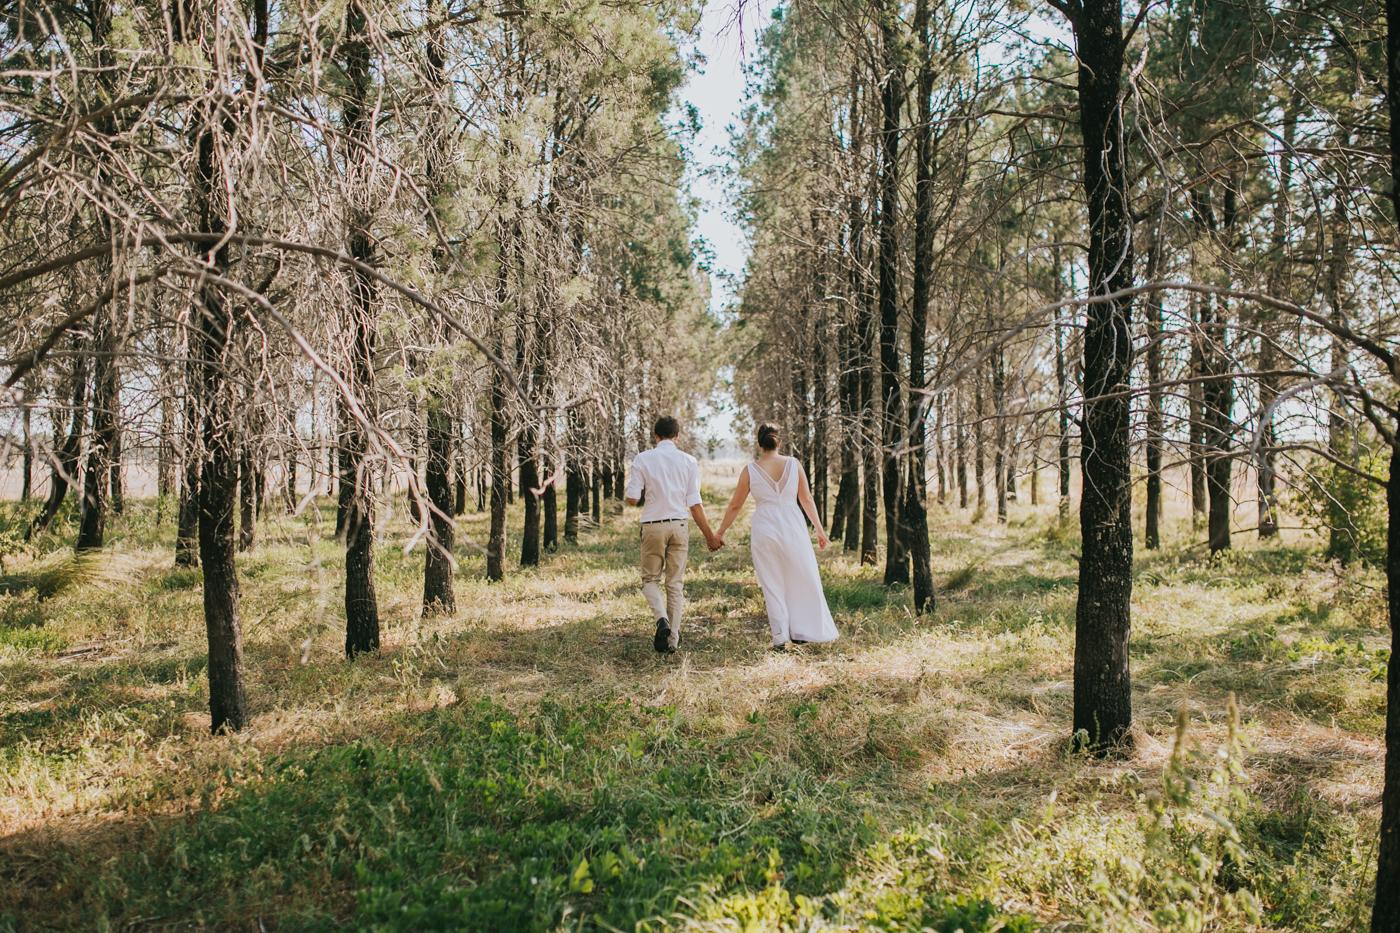 Nicolle & Jacob - Dubbo Wedding - Country Australia - Samantha Heather Photography-178.jpg